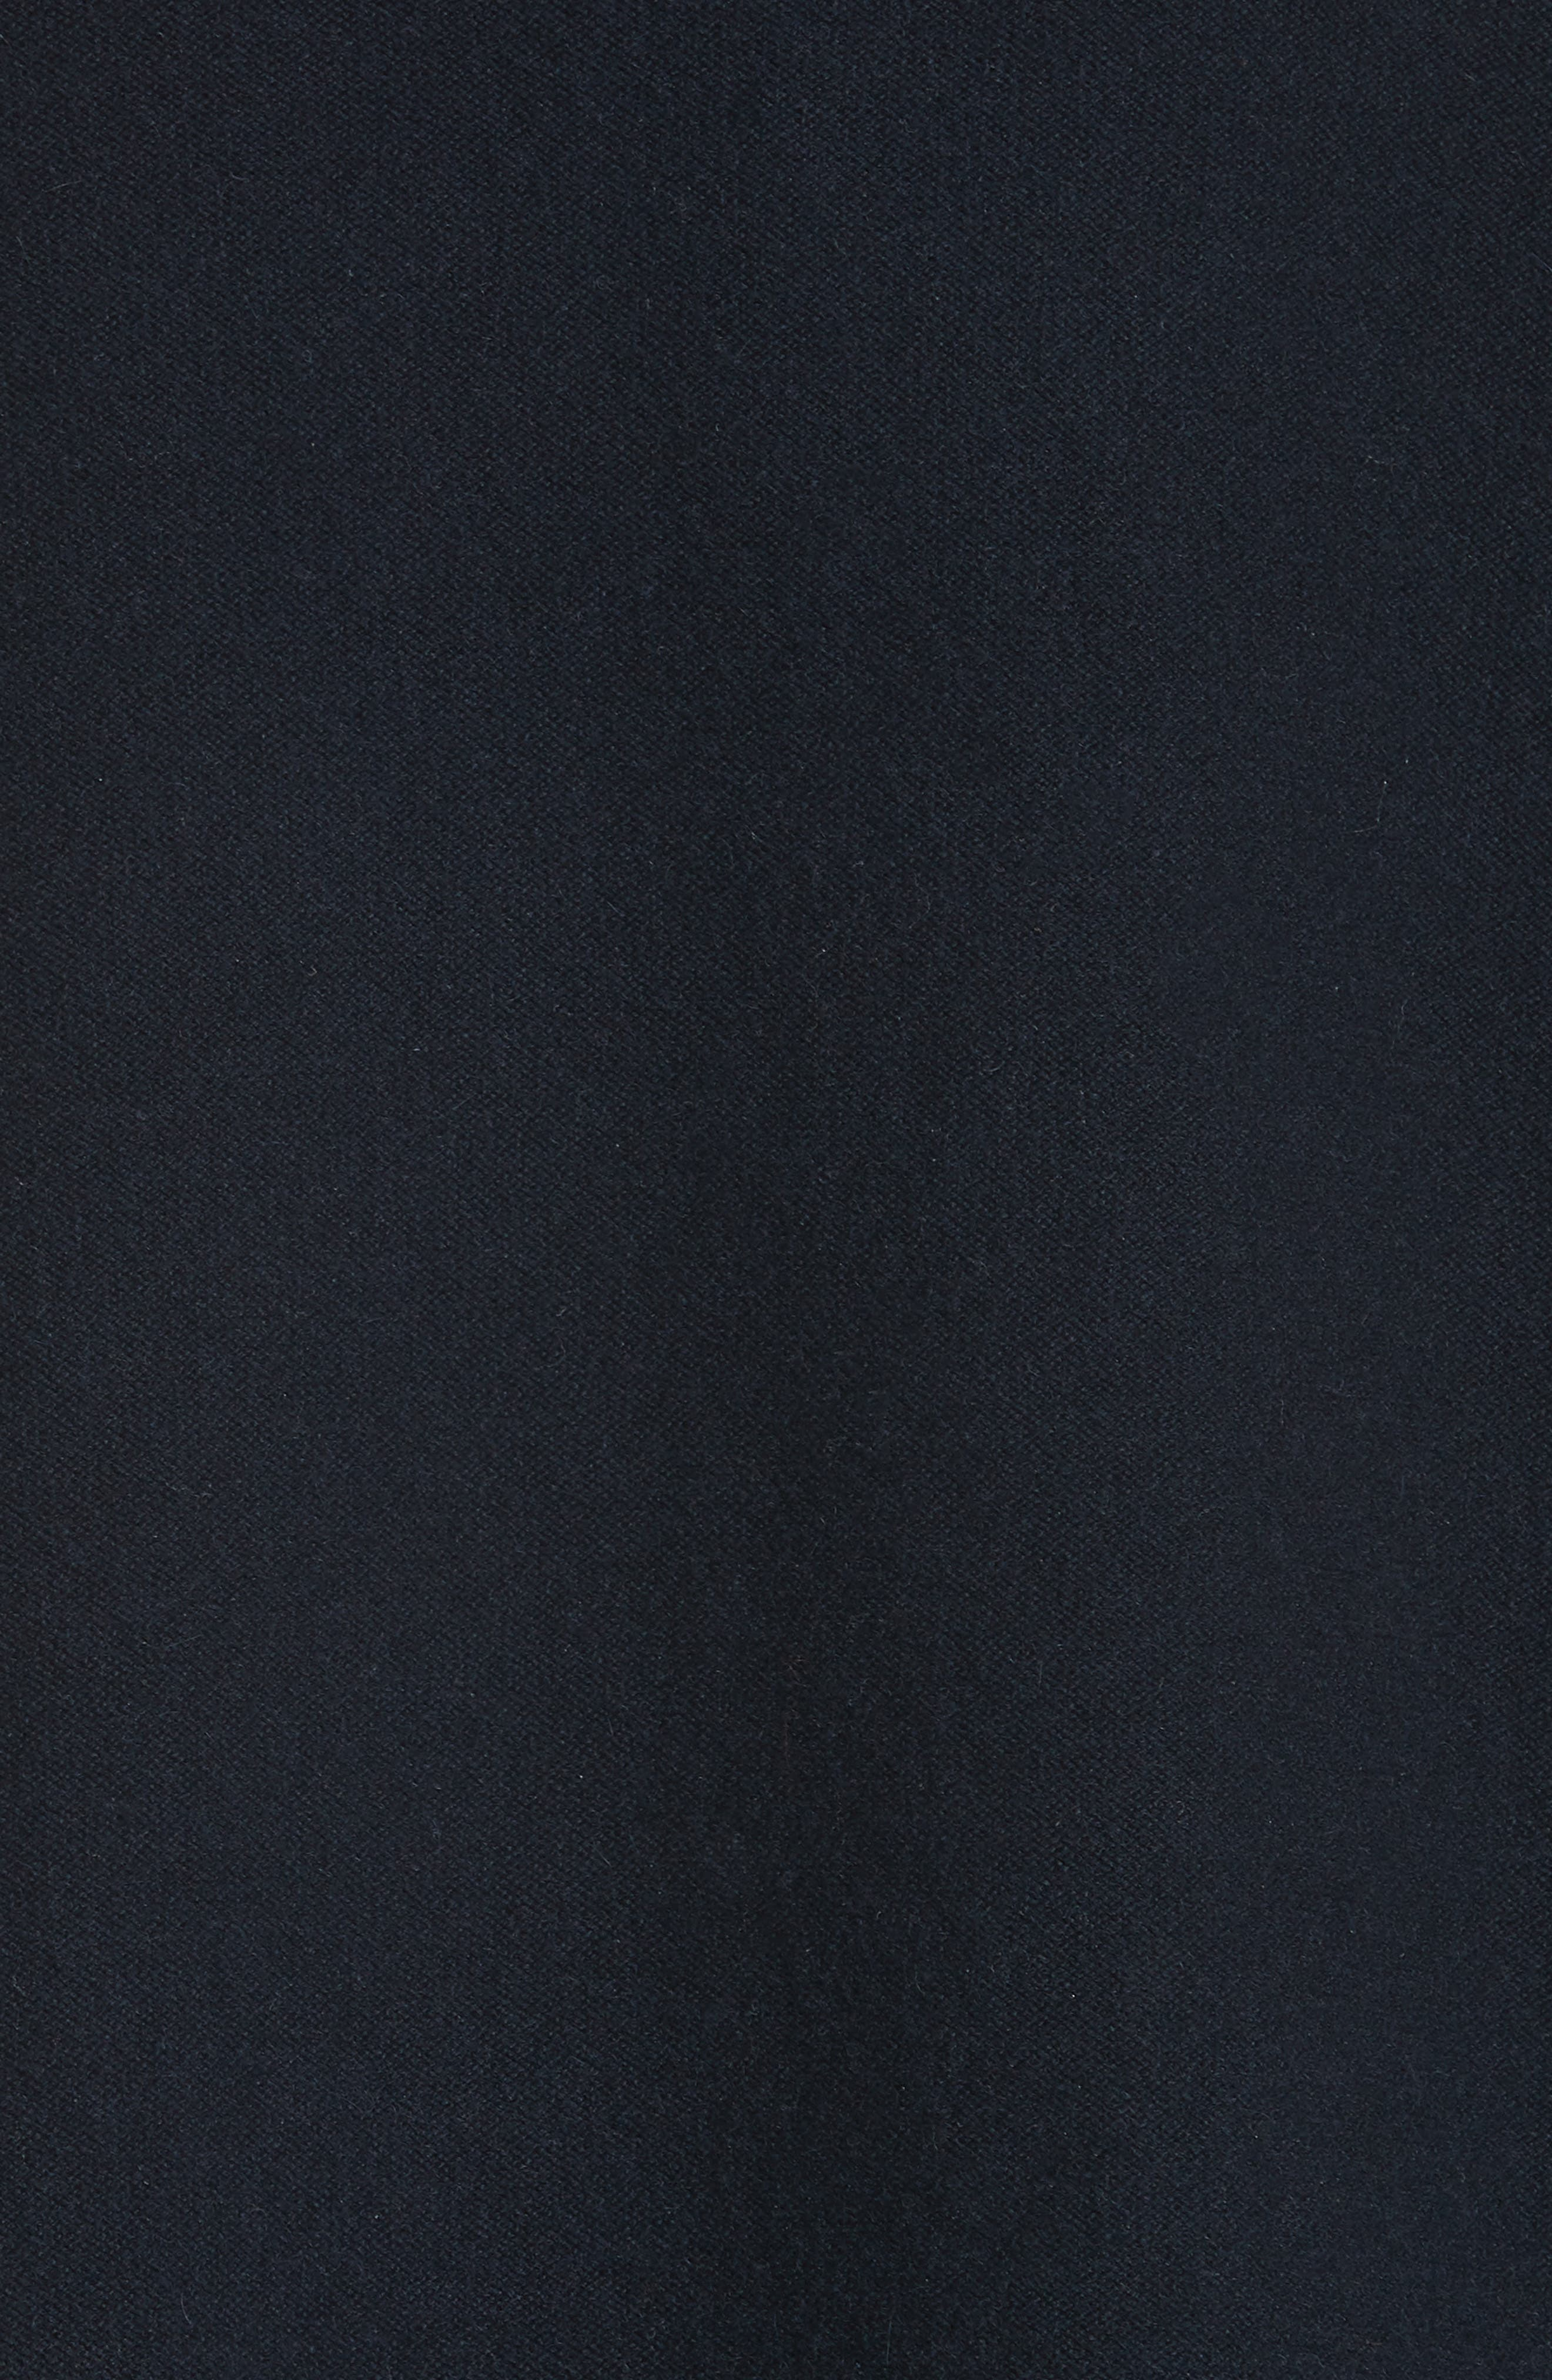 Bead Detail Cashmere Turtleneck Sweater,                             Alternate thumbnail 5, color,                             NIGHT BLUE